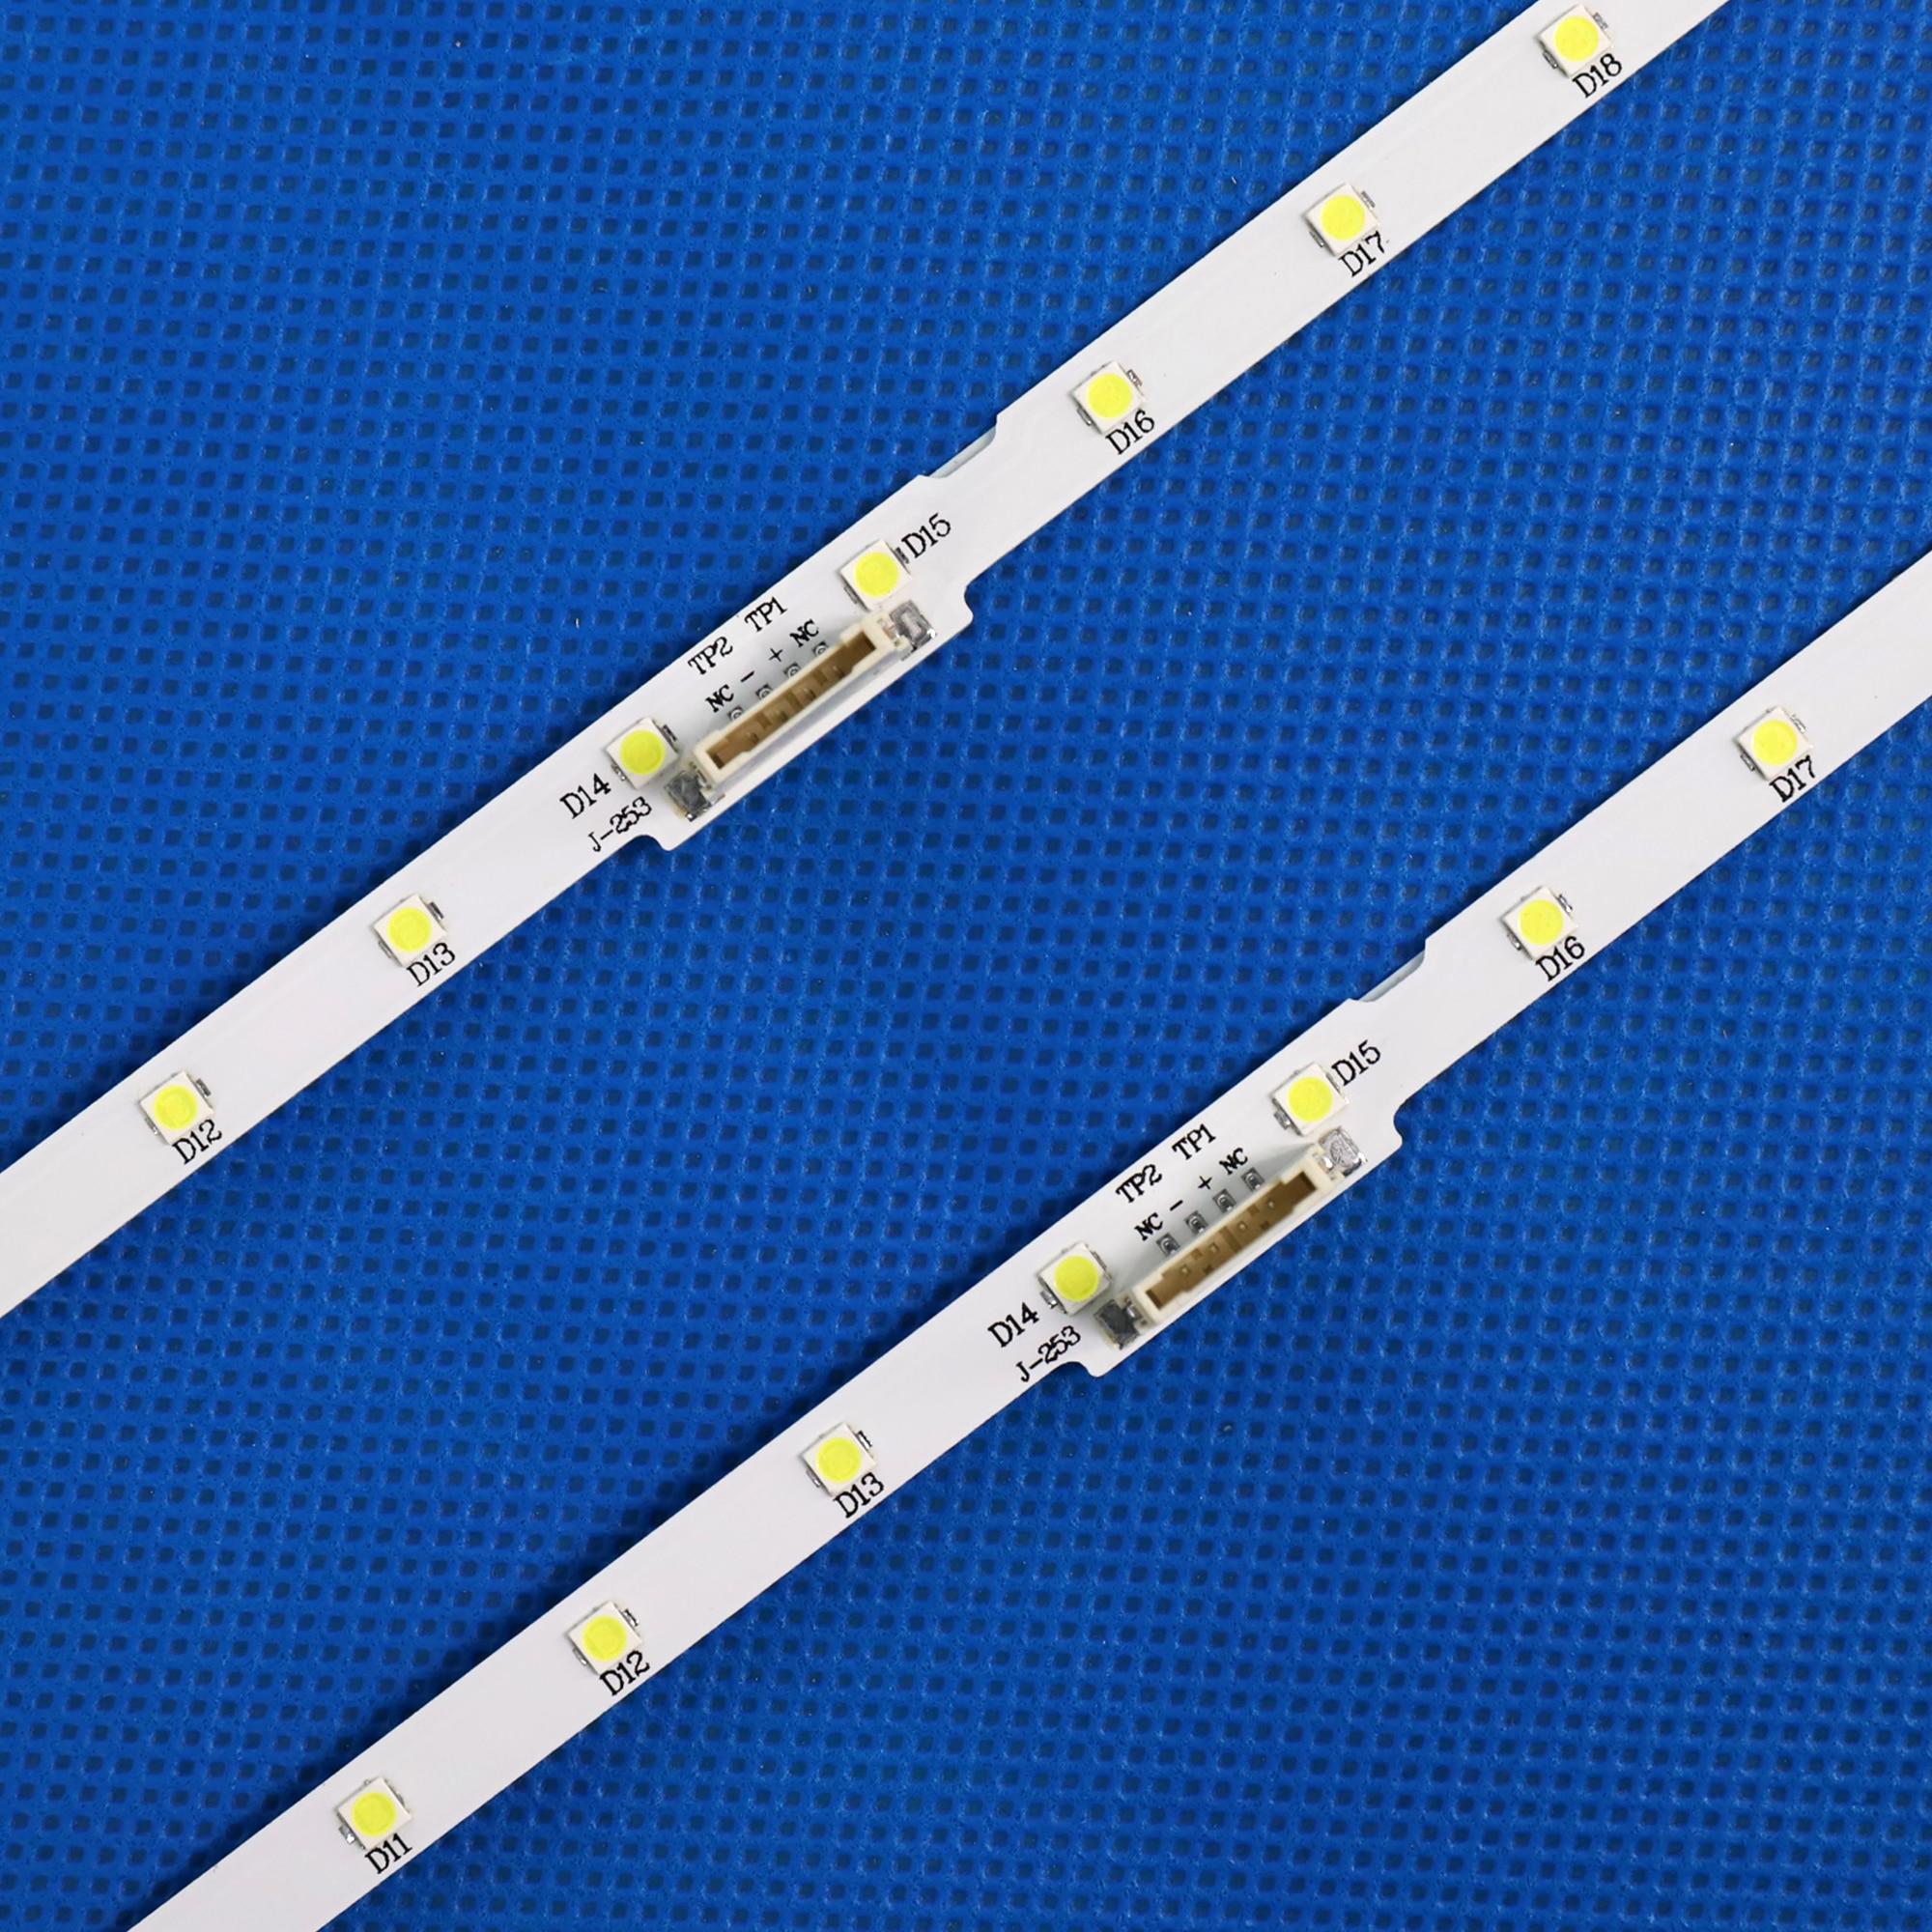 120 PCS/lot LED backlight strip for Samsung UN43NU7100 UE43NU7100 UE43NU7100U AOT_43_NU7100F UE43NU7120U UE43NU7170U BN96-45954A